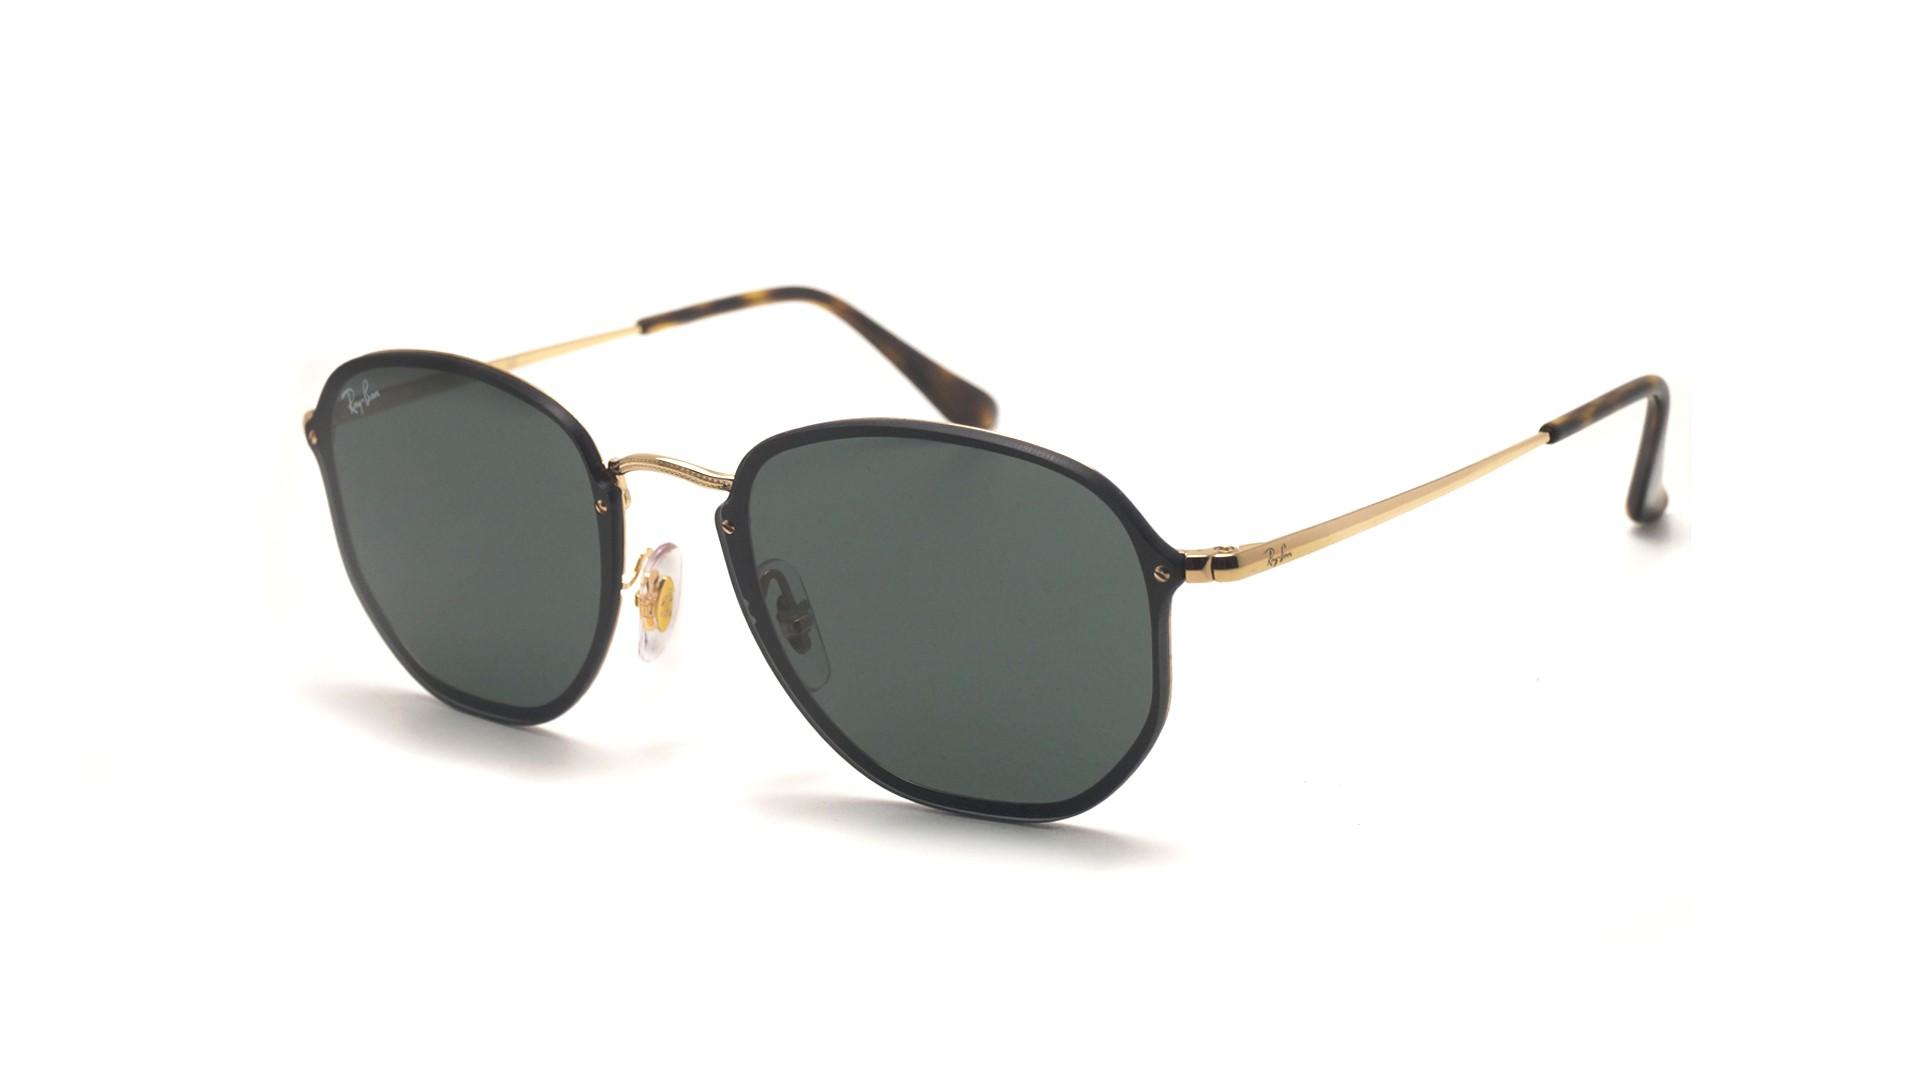 704547f062 Sunglasses Ray-Ban Hexagonal Blaze Gold RB3579N 001 71 58-15 Large